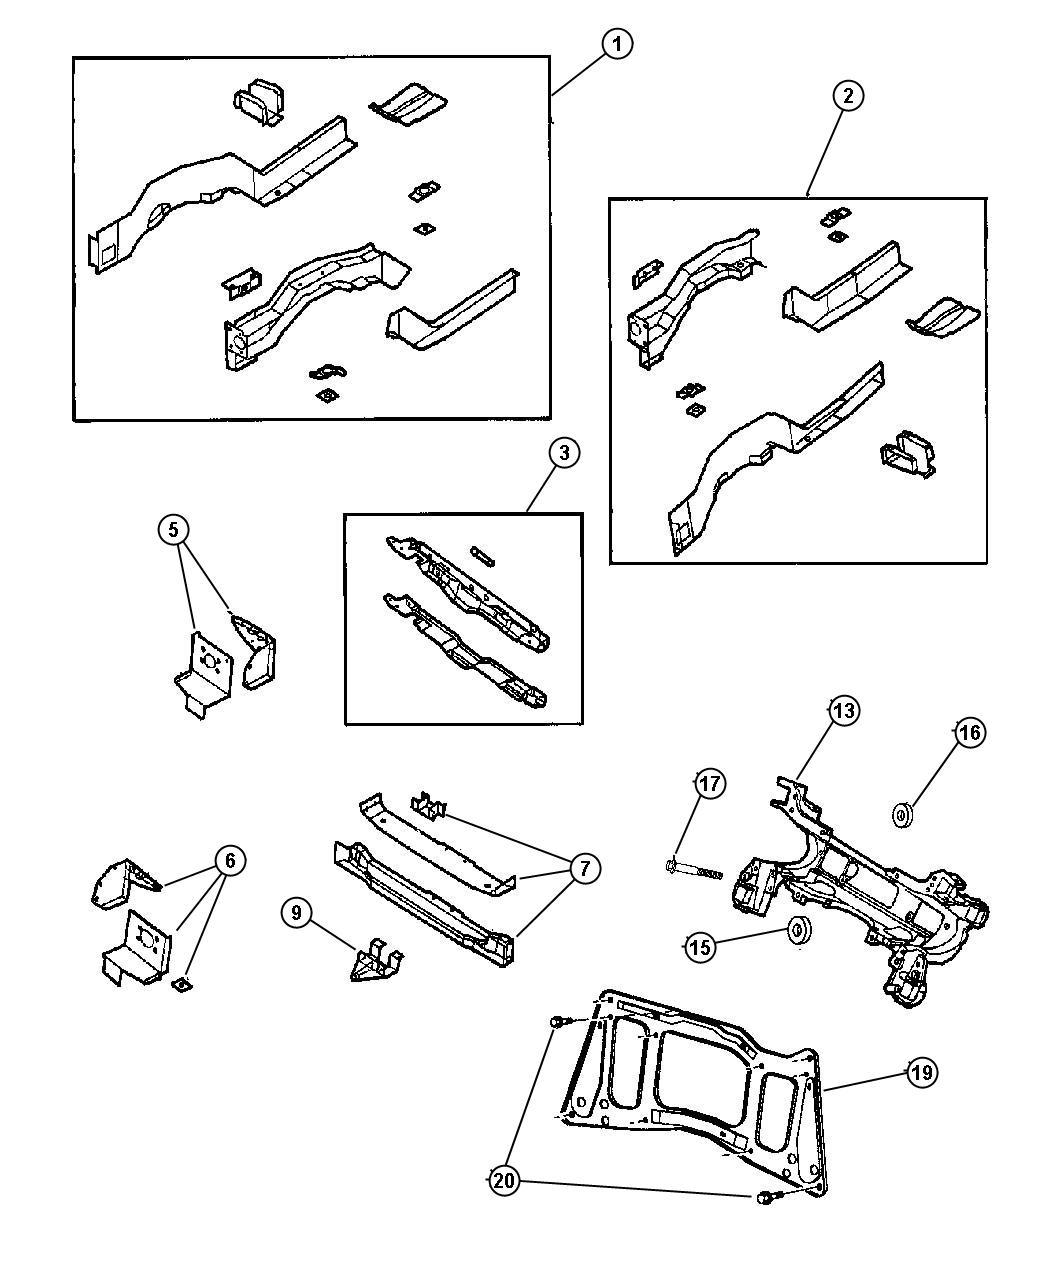 Dodge Ram Nut Mounting Hex Flange Lock M14x2 Sprg